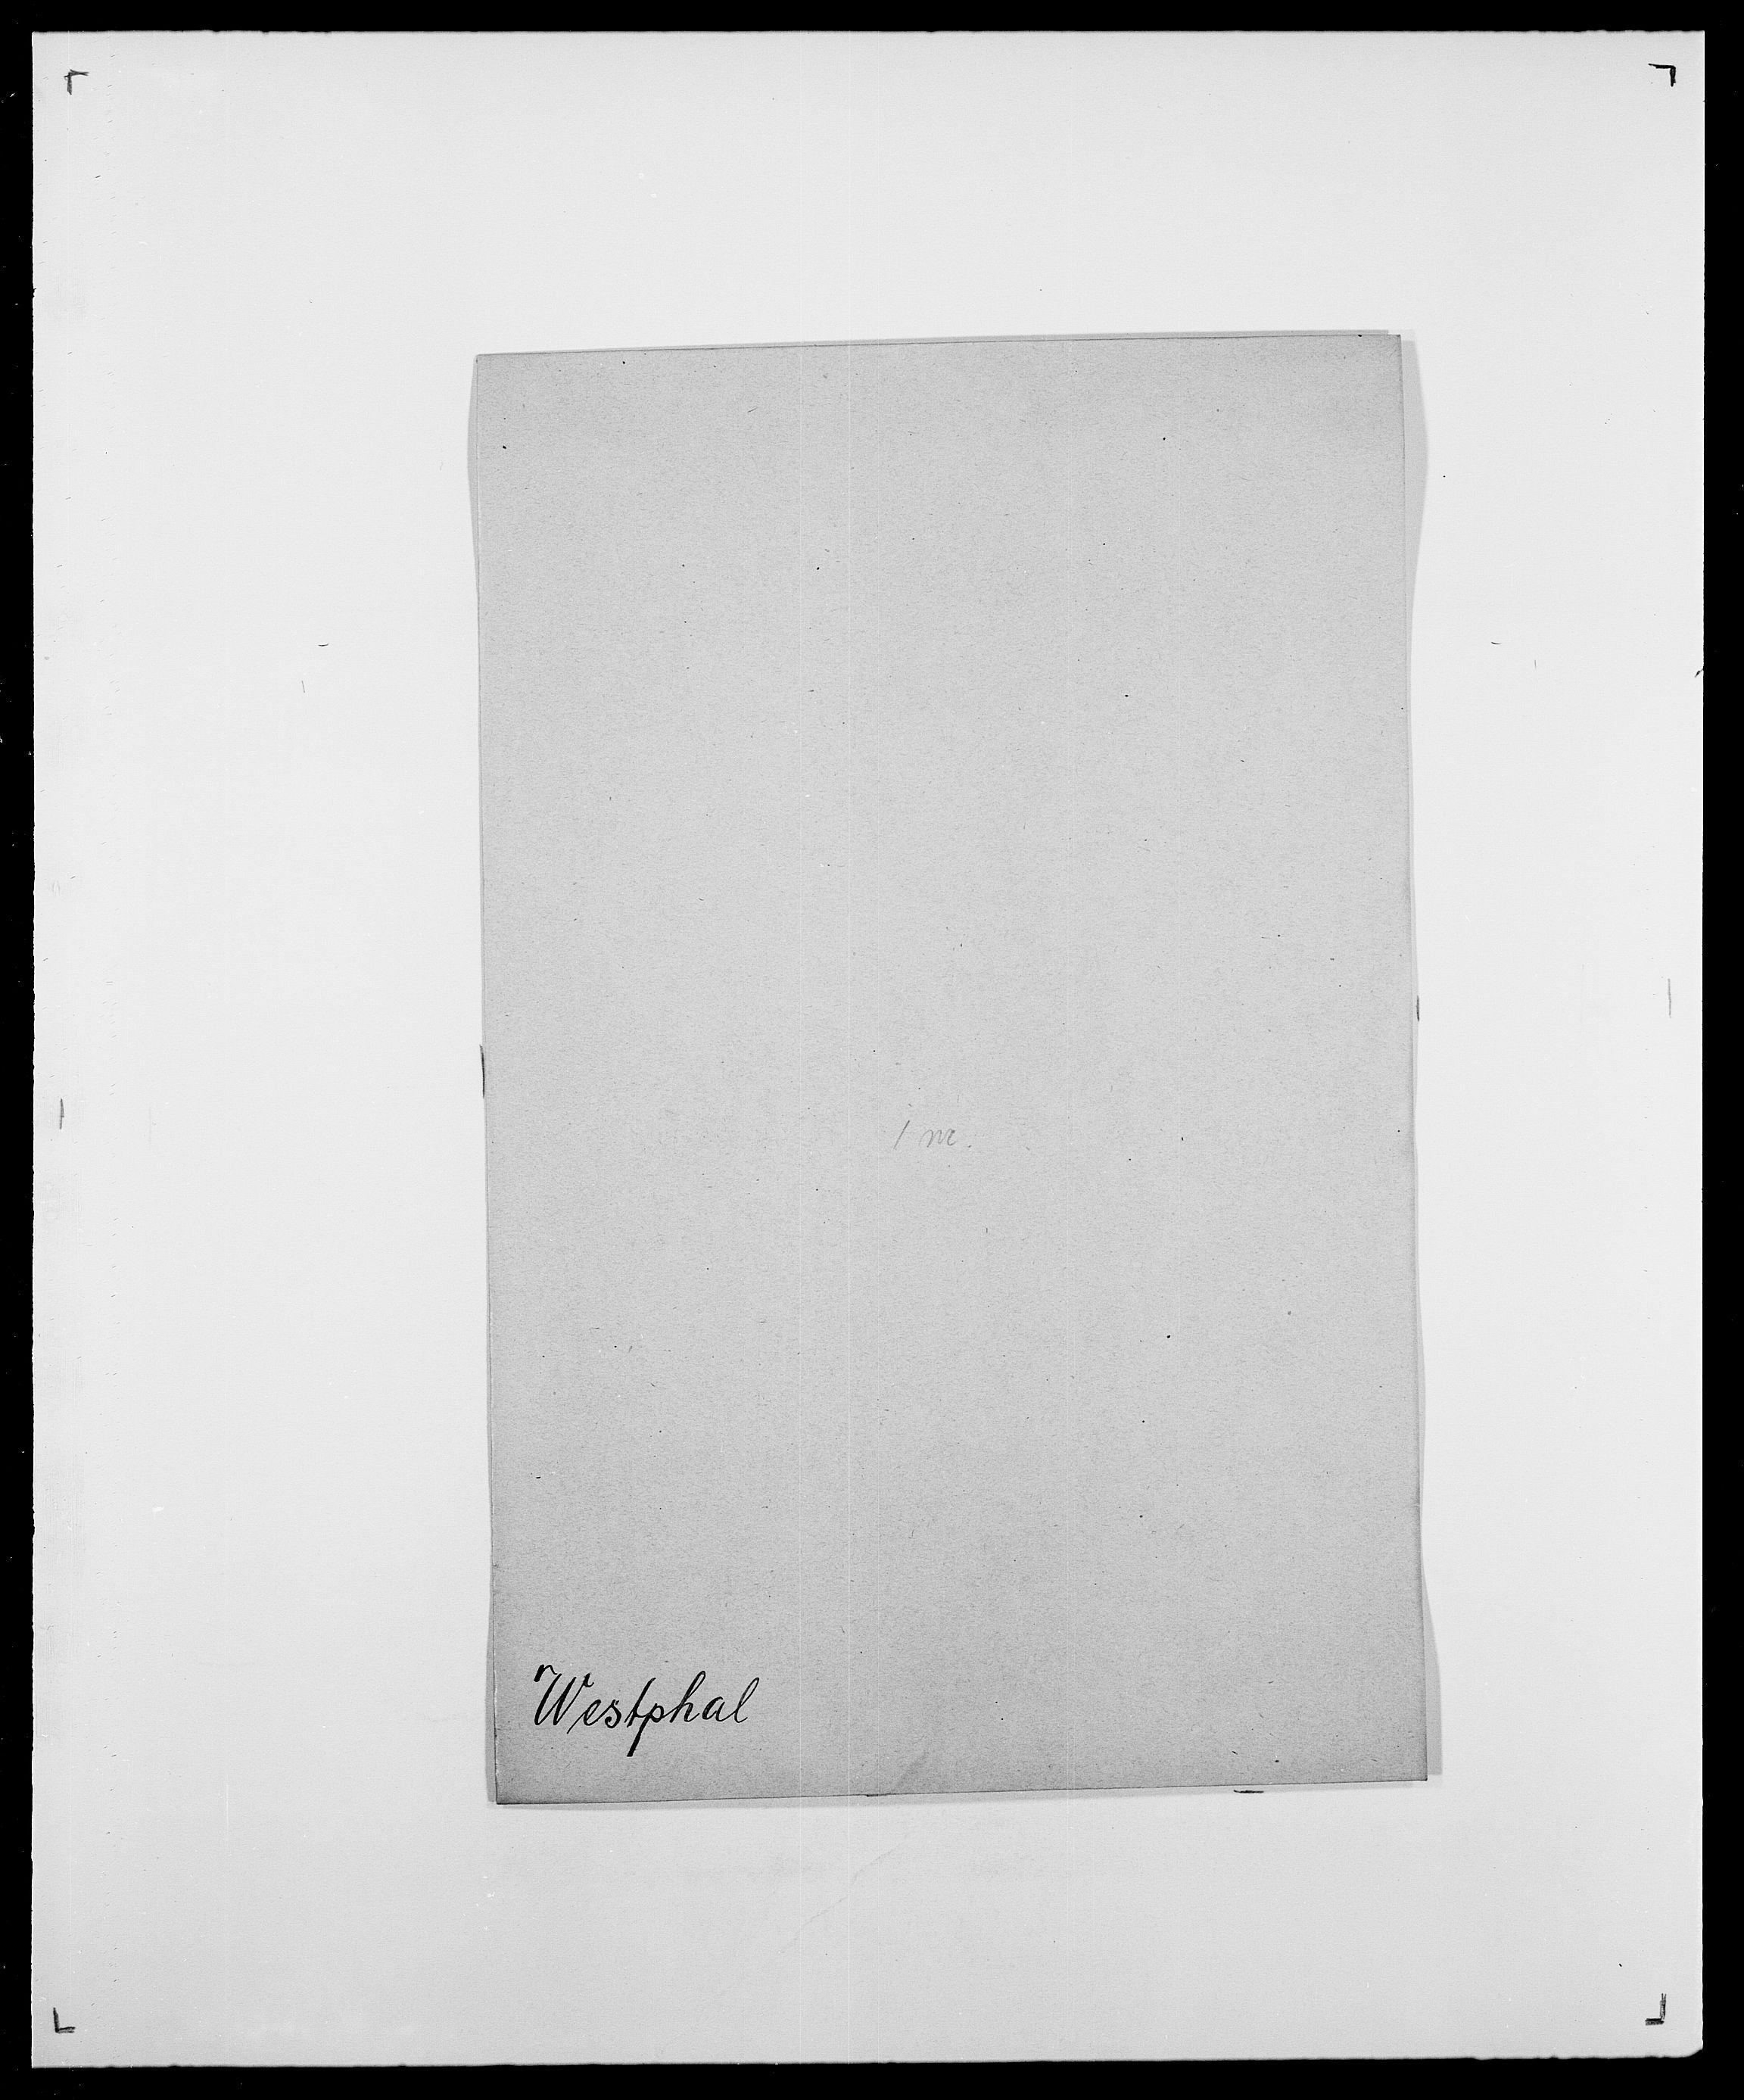 SAO, Delgobe, Charles Antoine - samling, D/Da/L0041: Vemmestad - Viker, s. 302